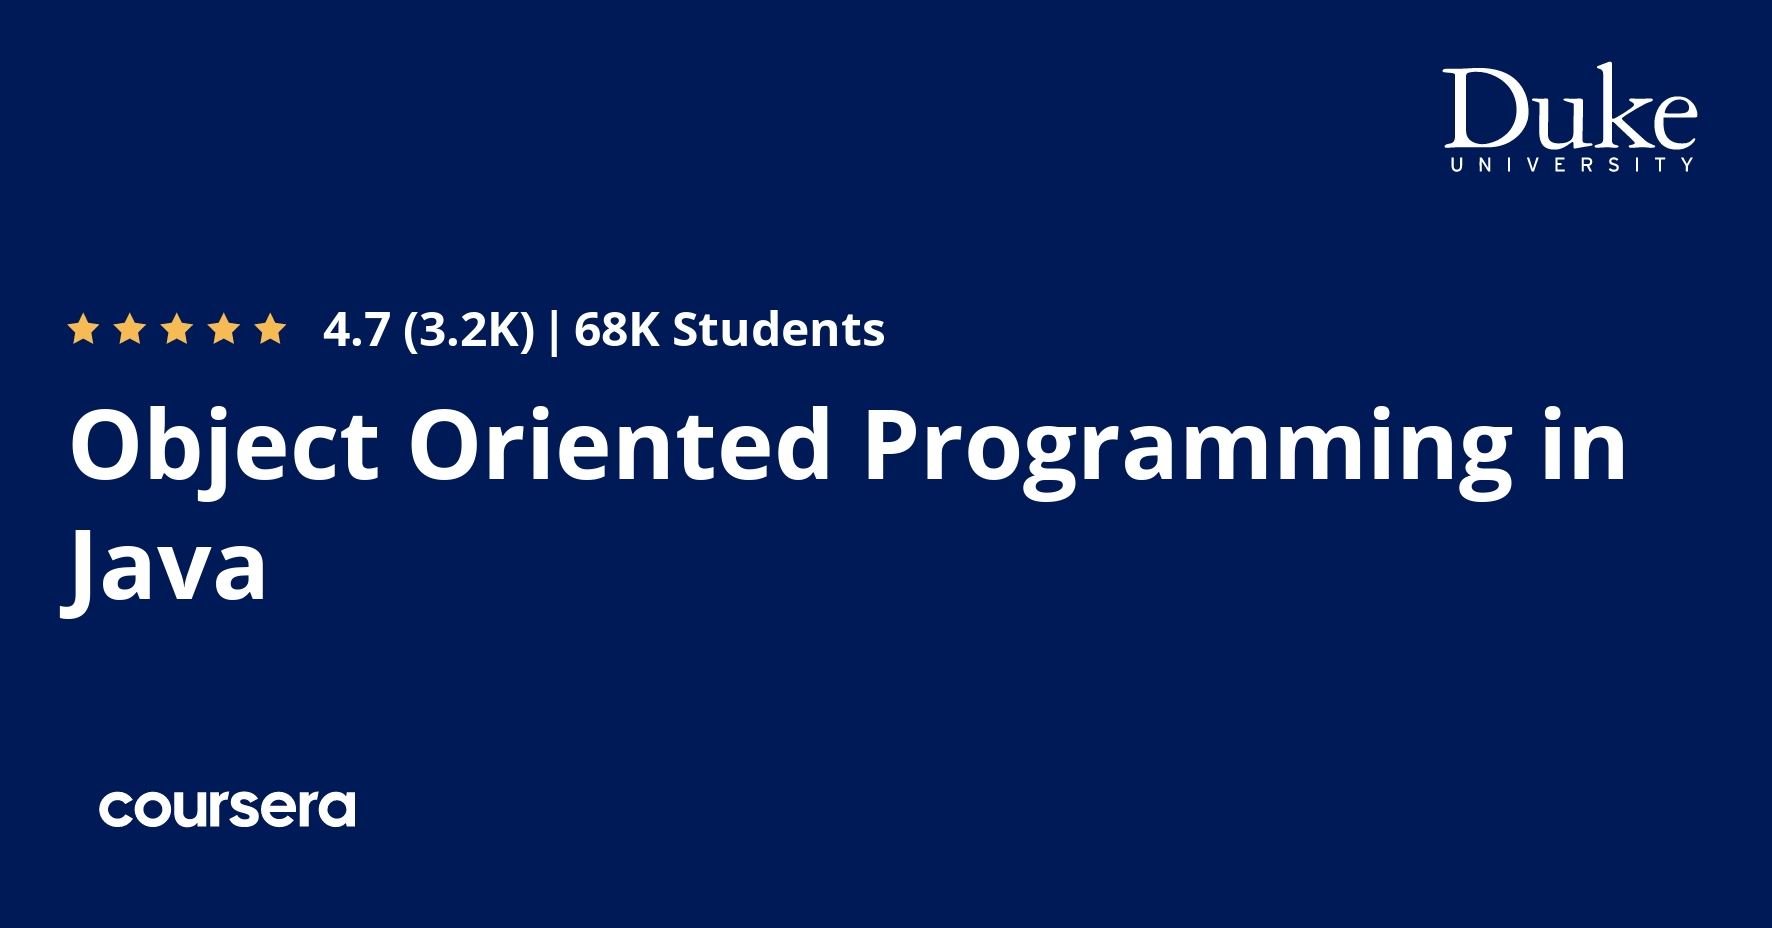 Object Oriented Programming in Java Specialization